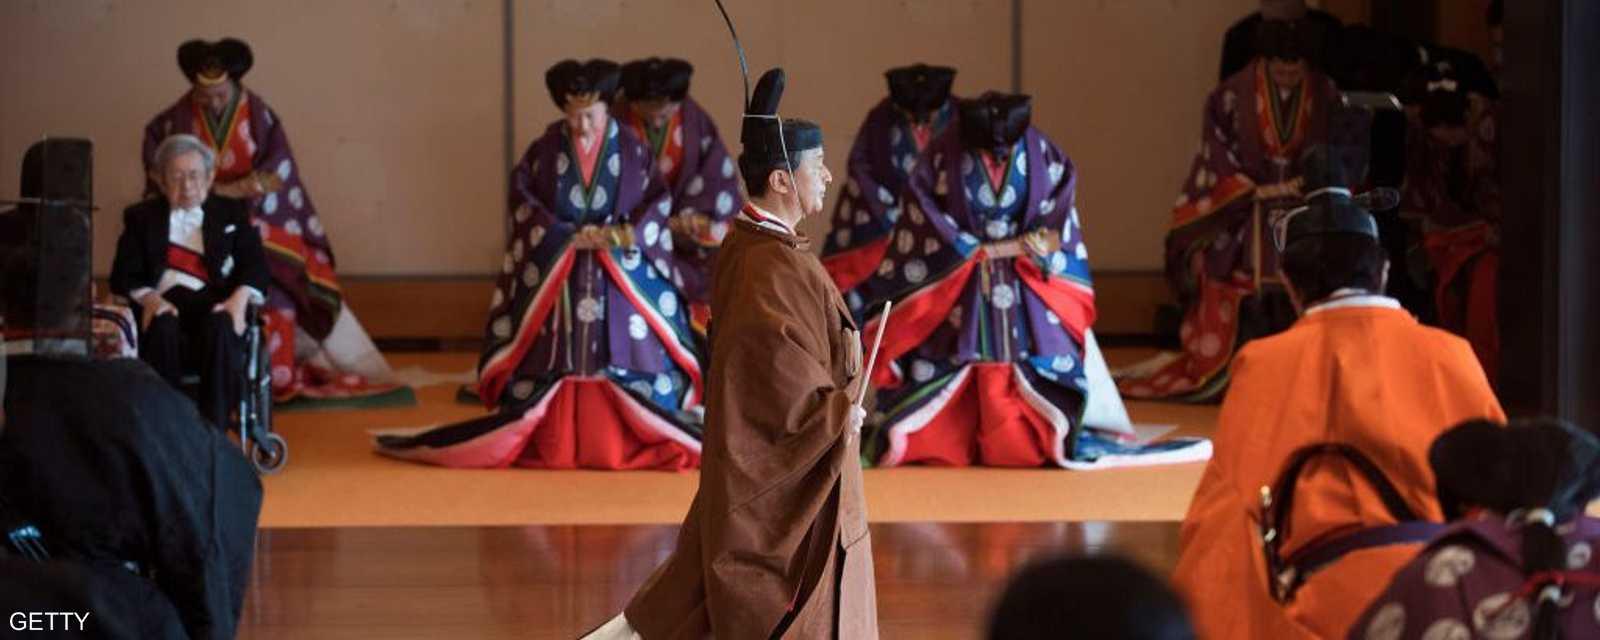 الإمبراطور ناروهيتو مغادرا المراسم بعد تنصيبه رسميا